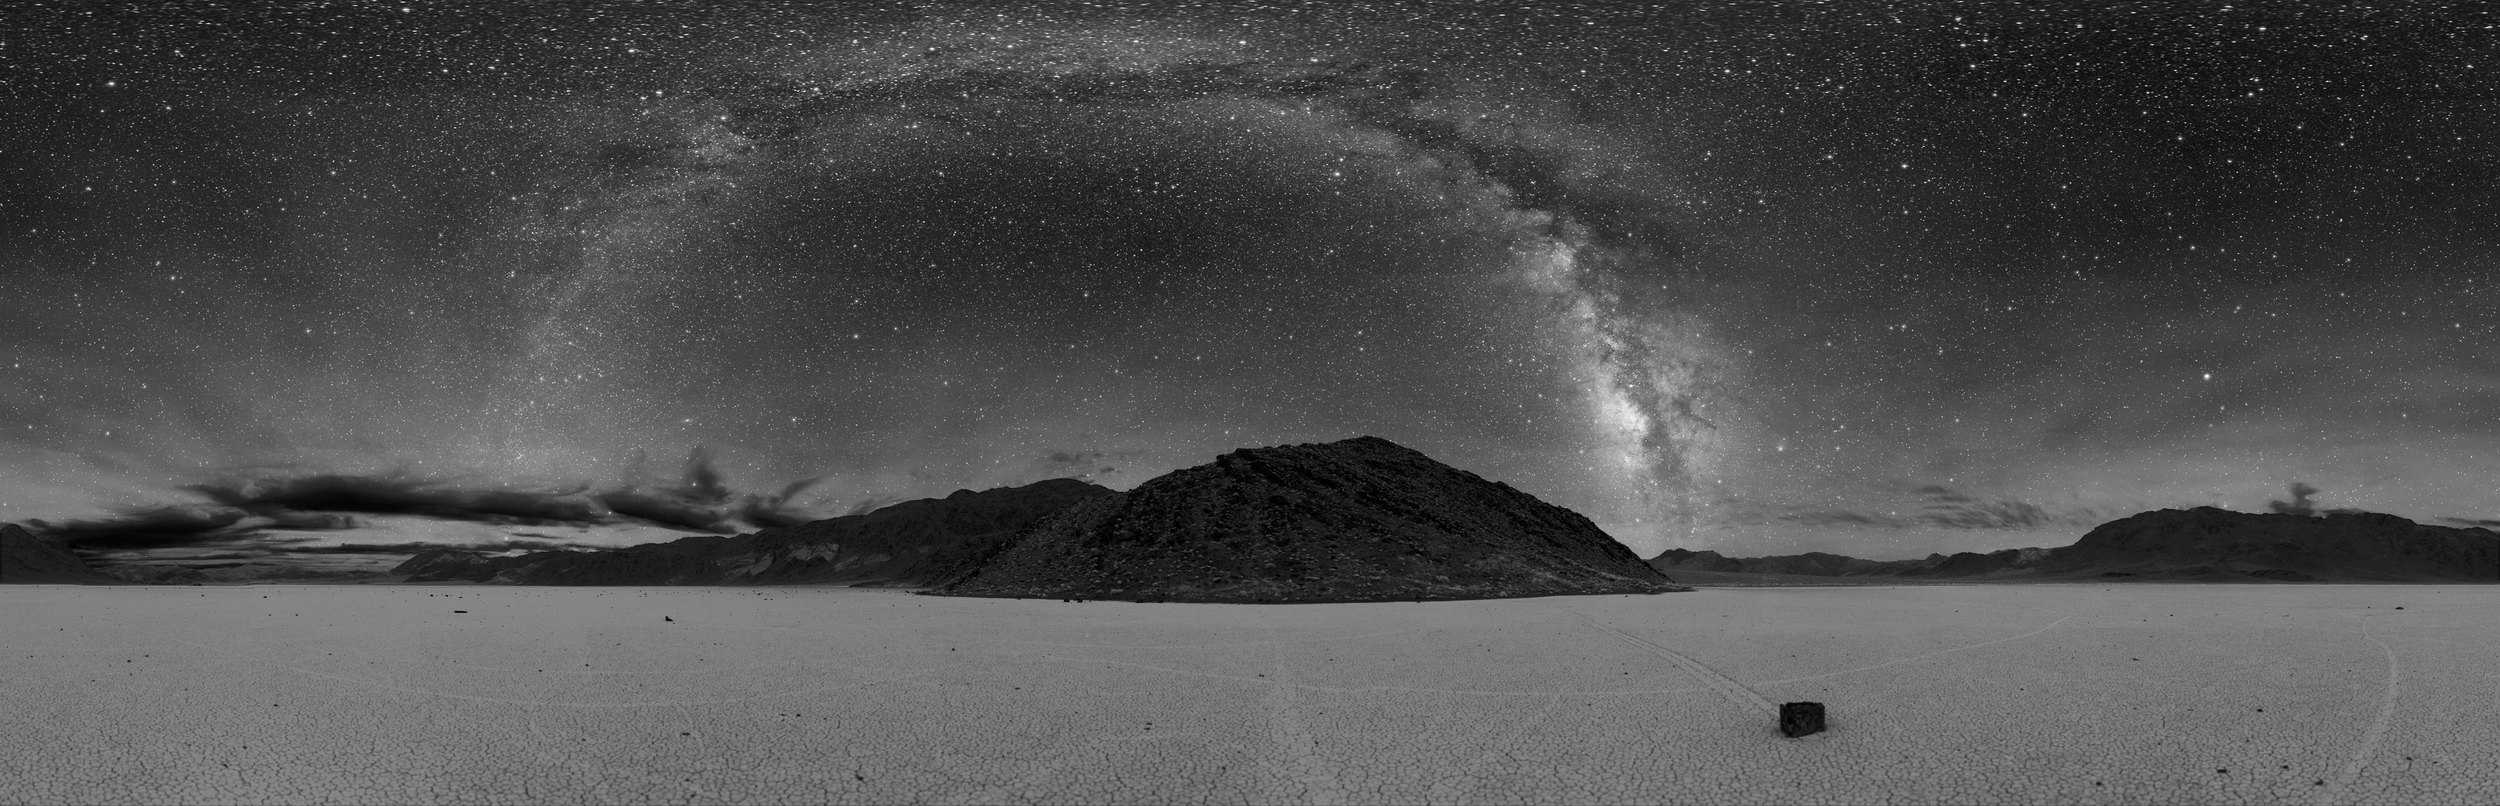 Milky Way stars Death Vally National Park